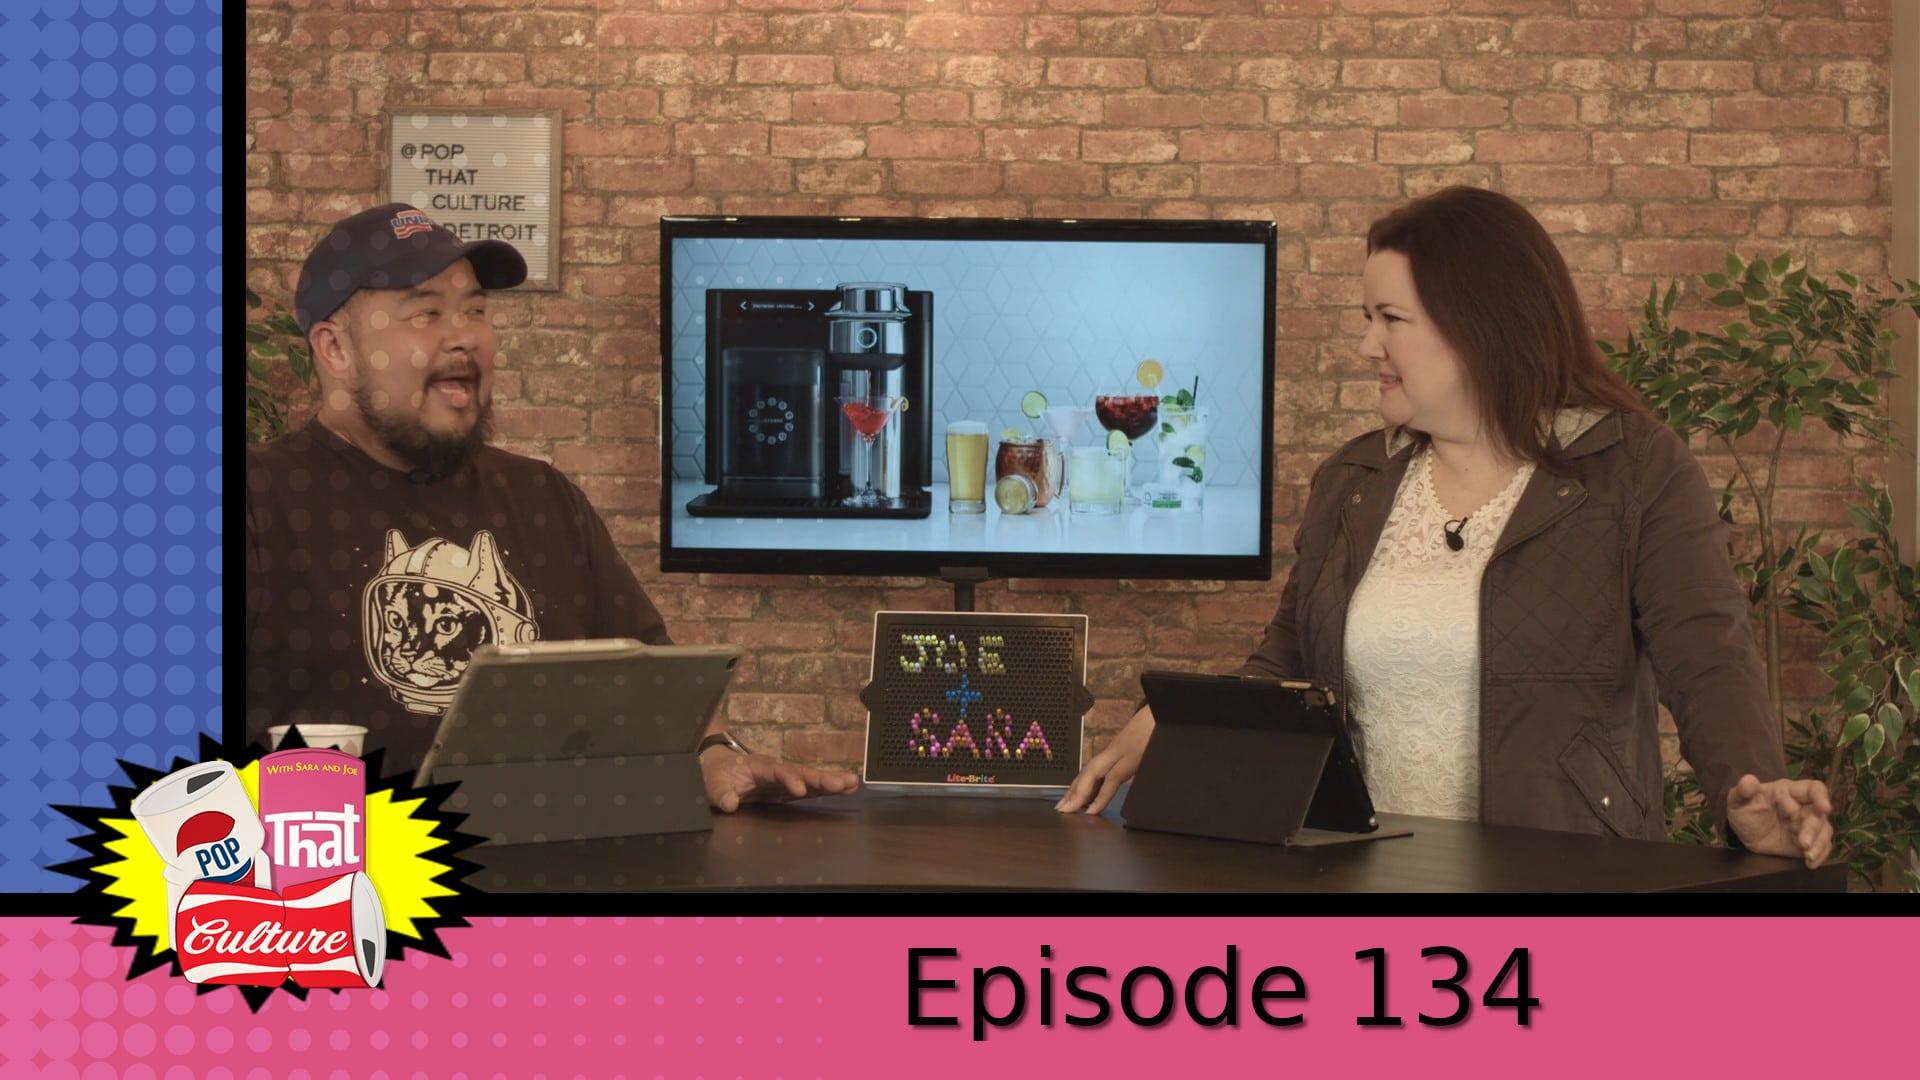 Pop That Culture - Episode 134